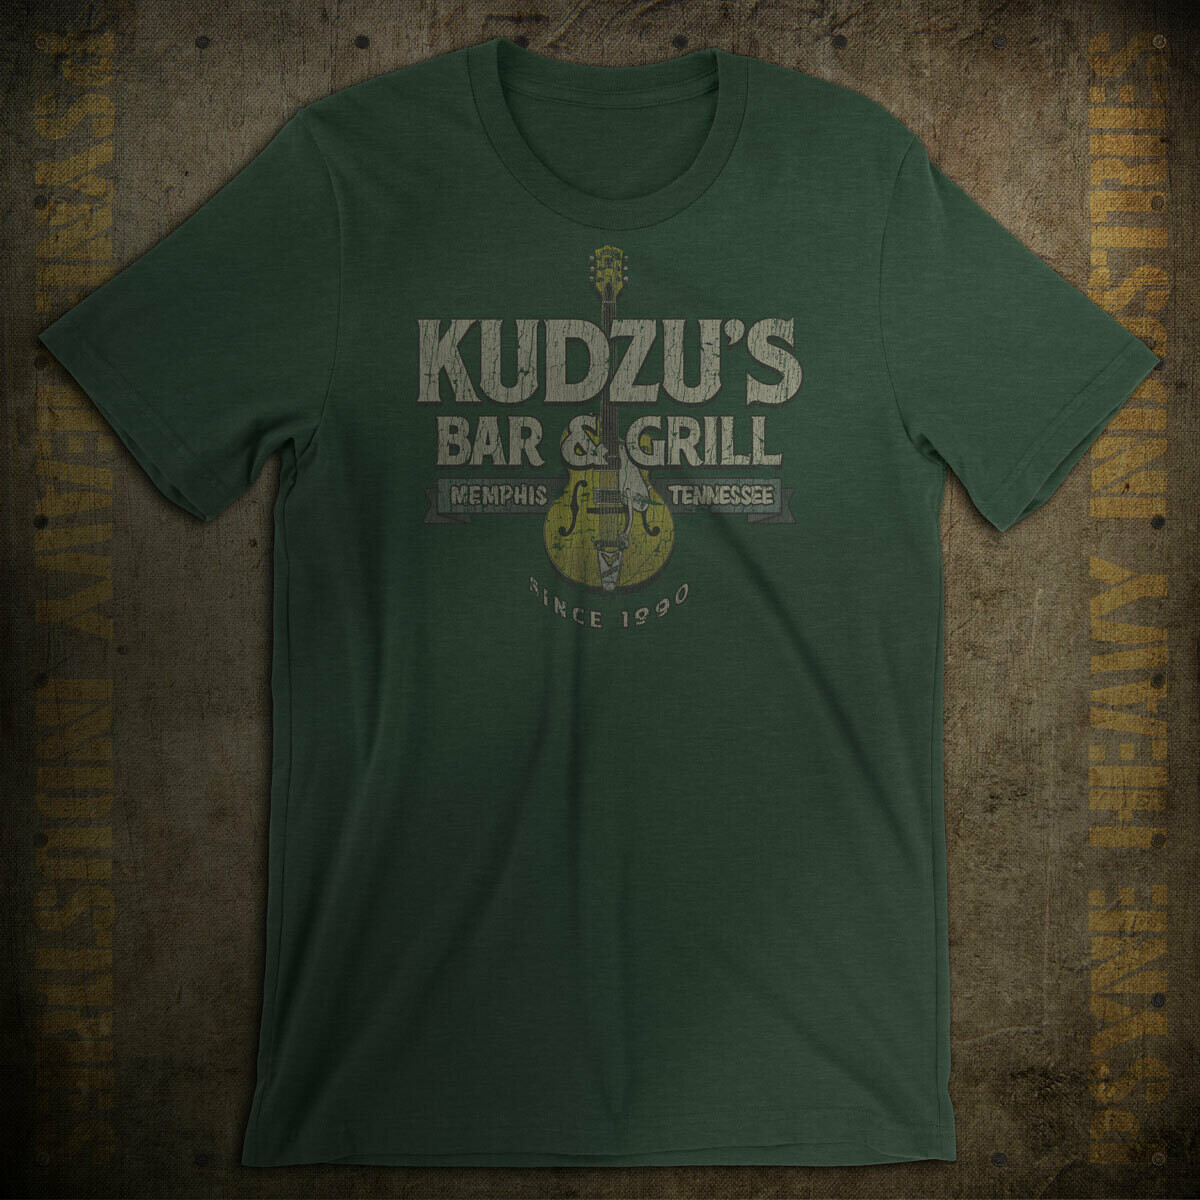 Kudzu's Bar & Grill Vintage Memphis T-Shirt